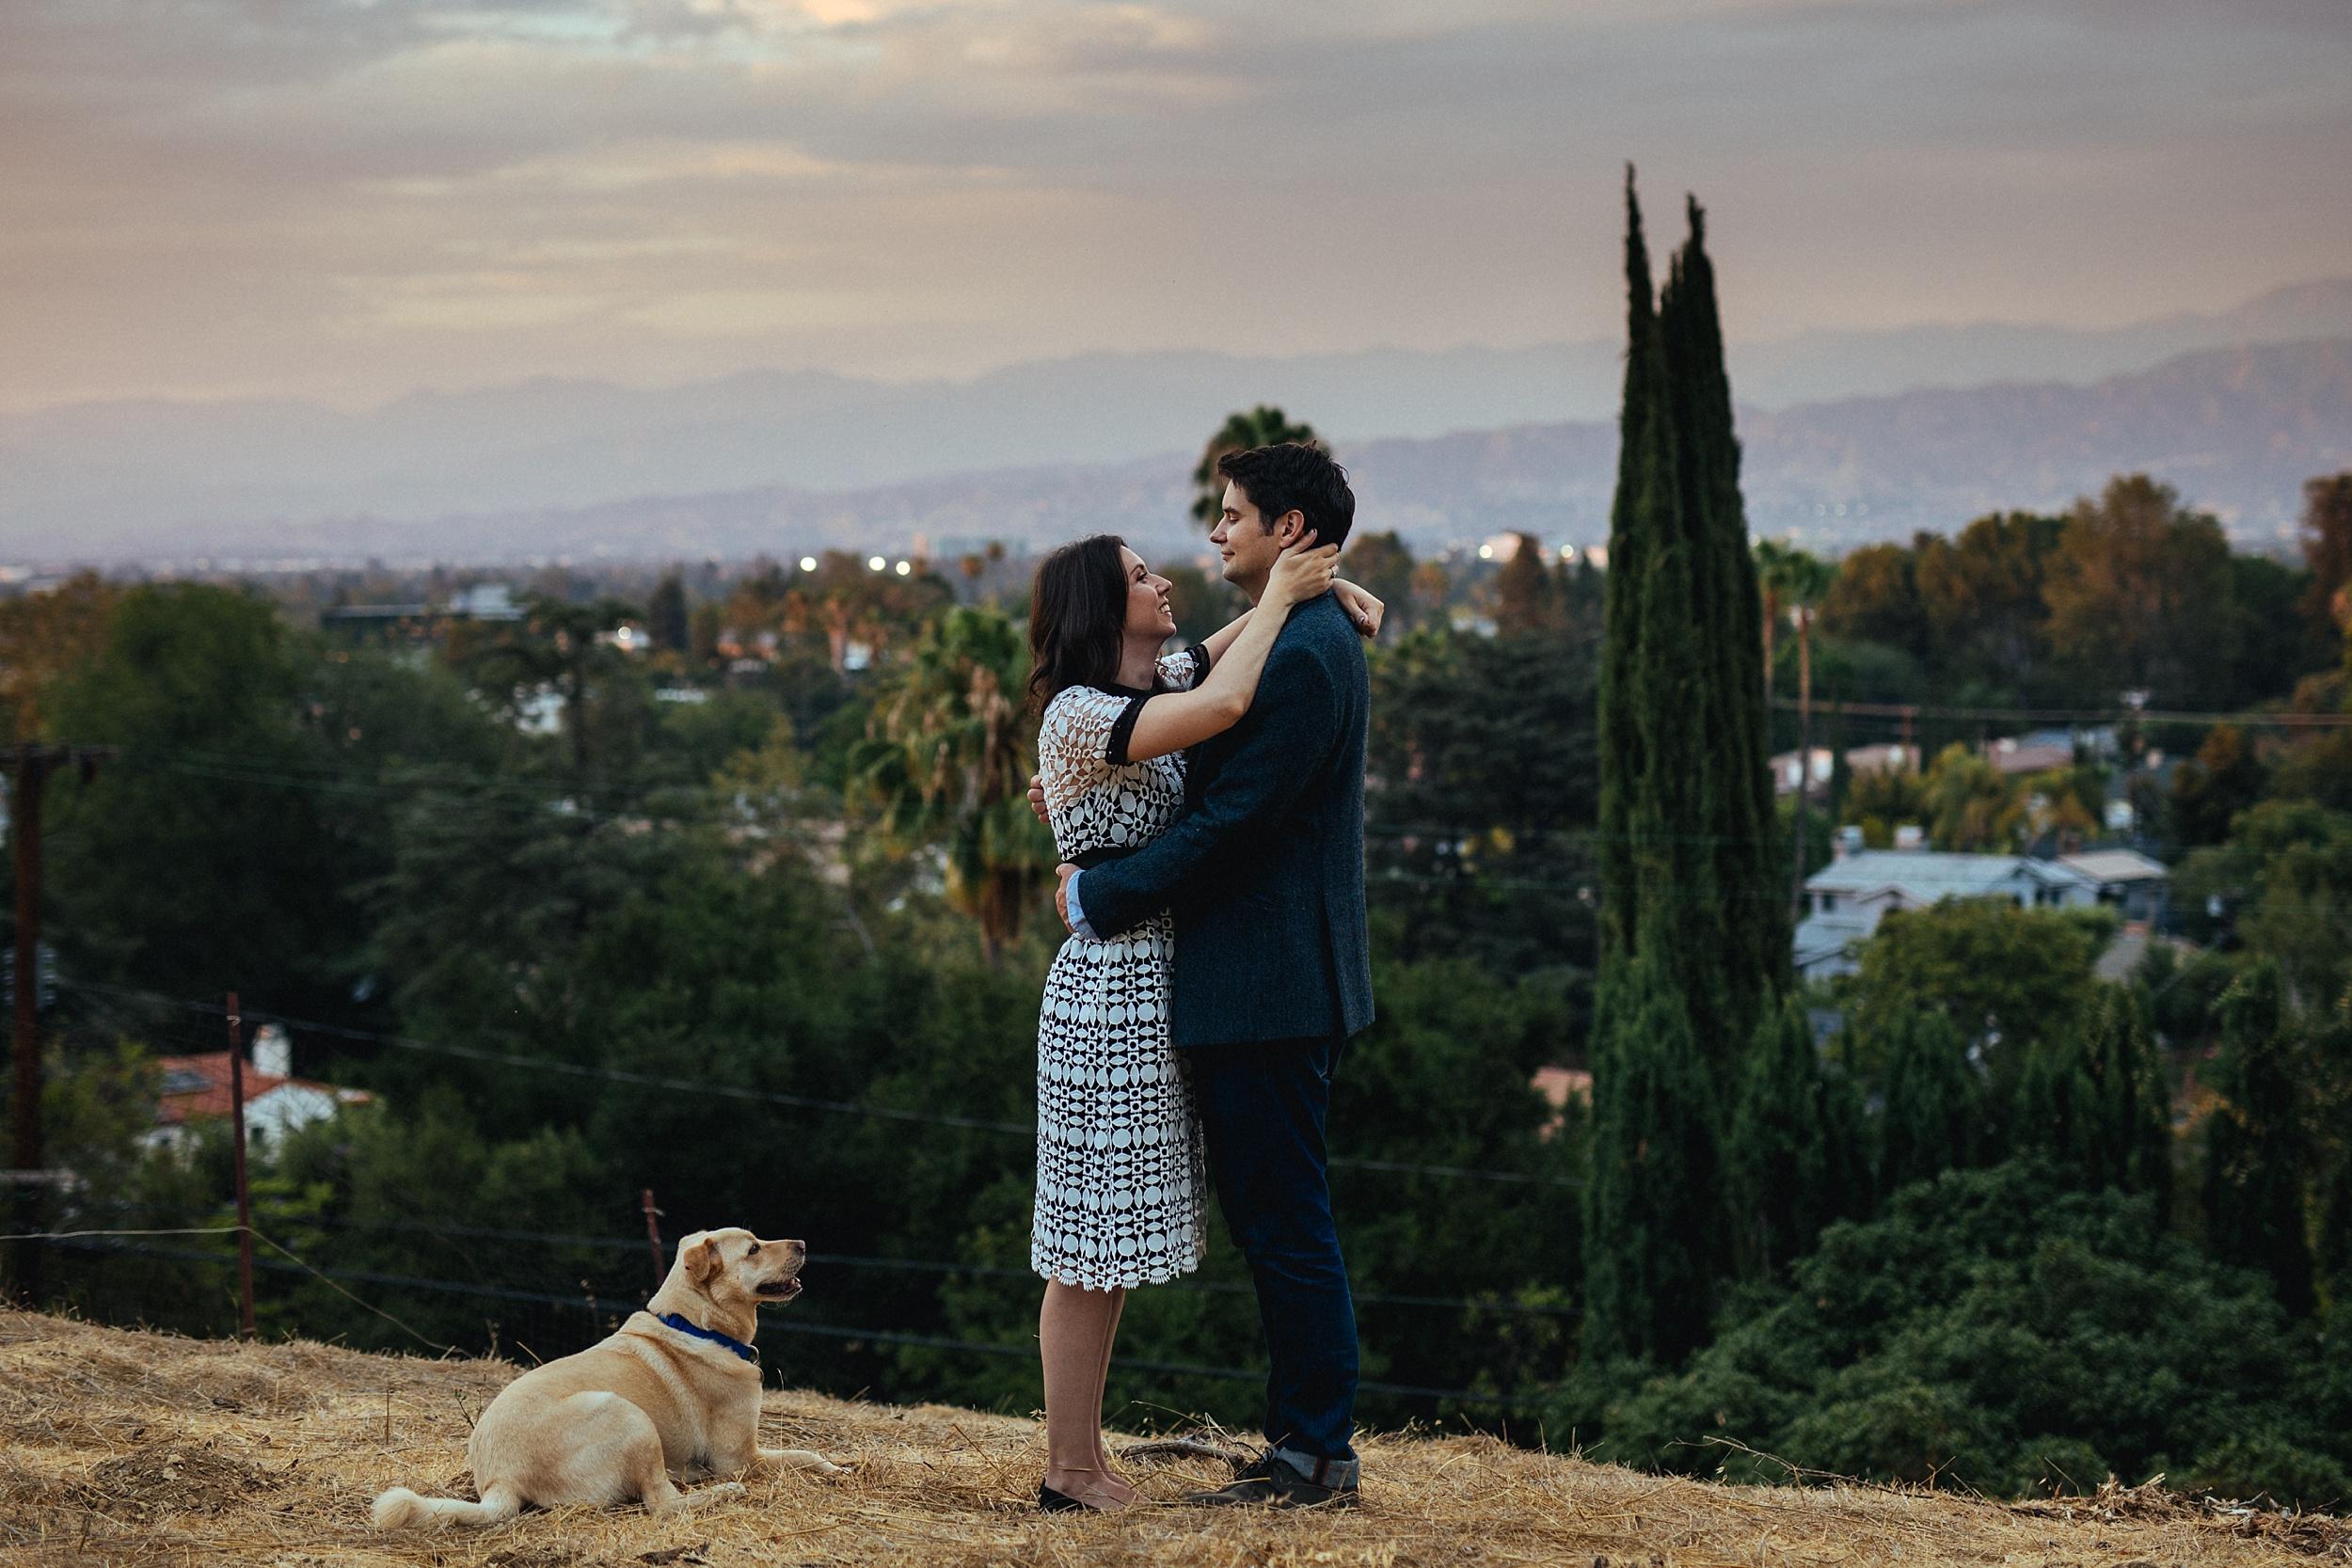 Studio-City-LA-Engagement-16.jpg